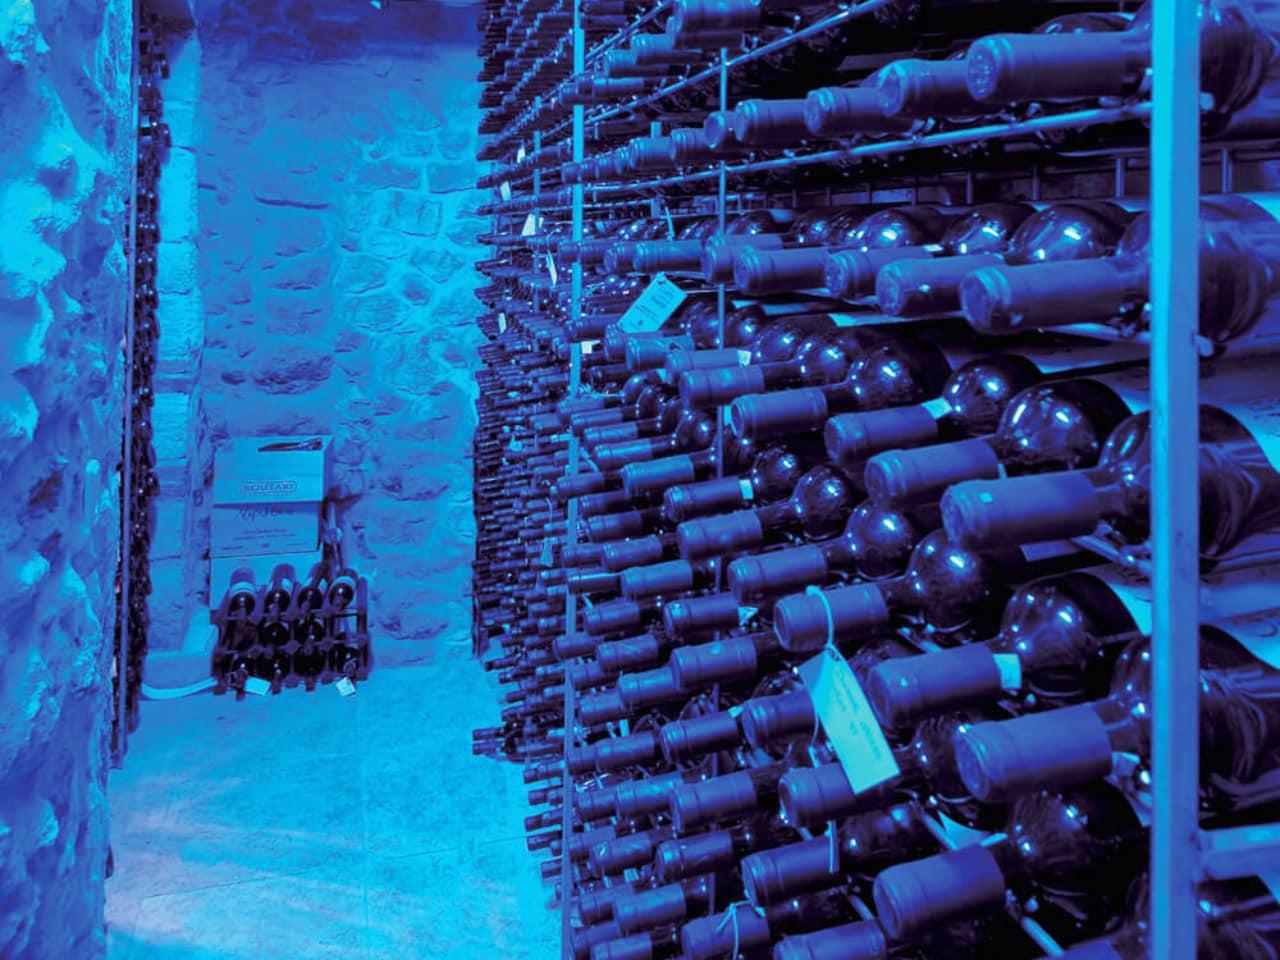 wine tasting avli restaurant rethimno, rethymno avli restaurant, organic wine tasting rethimno, wine cellar avli restaurant crete, Hellenic viniculture, greek wine makers,  largest restaurant wine cellars in Greece, best activity rethimno crete, things to do crete